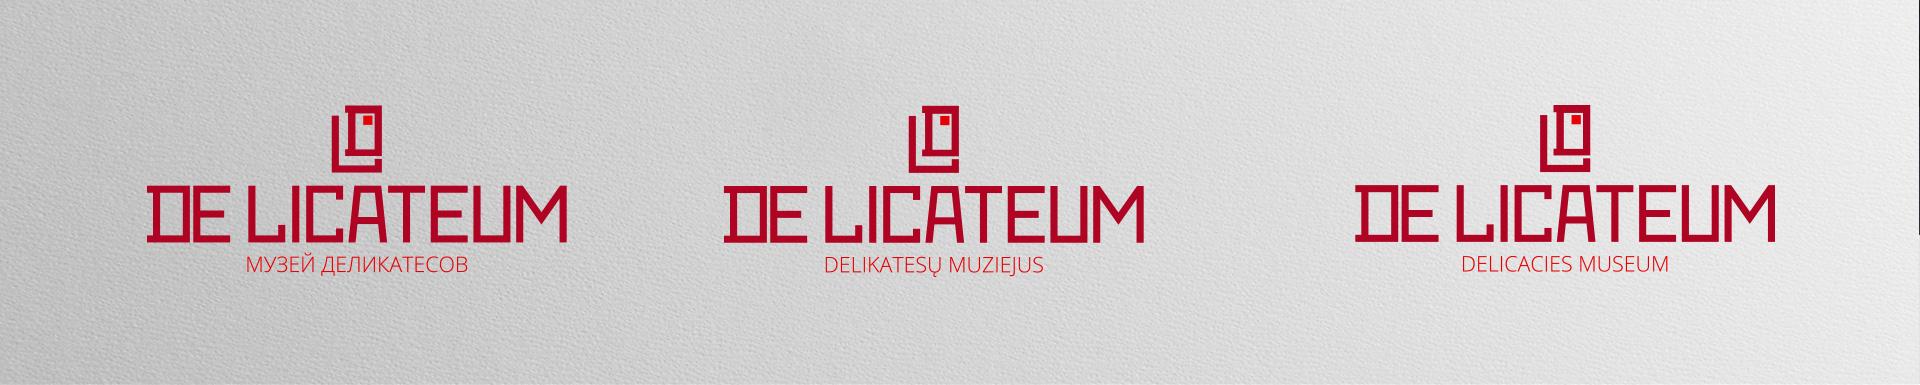 delicateum_line_logo_2